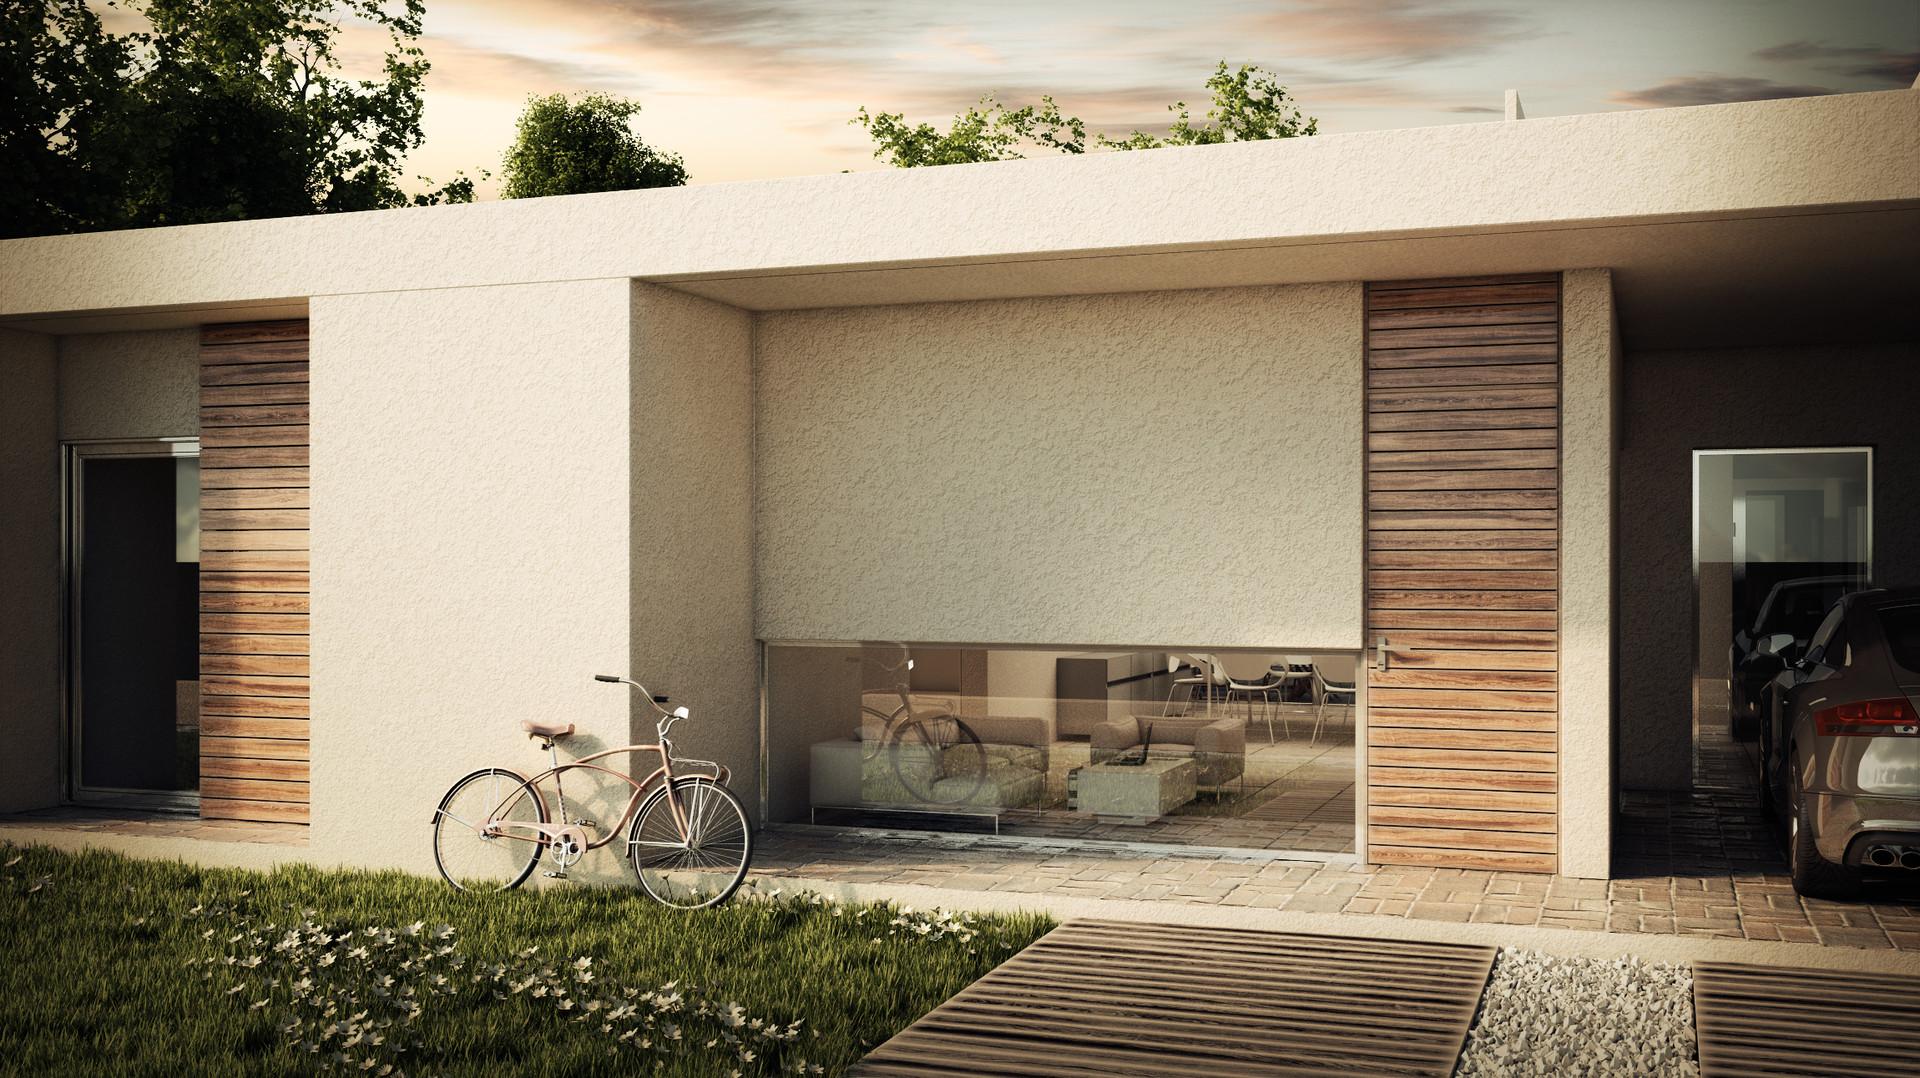 Bruno bolognesi casa en funes 5 by bman2006 d6k6ccw